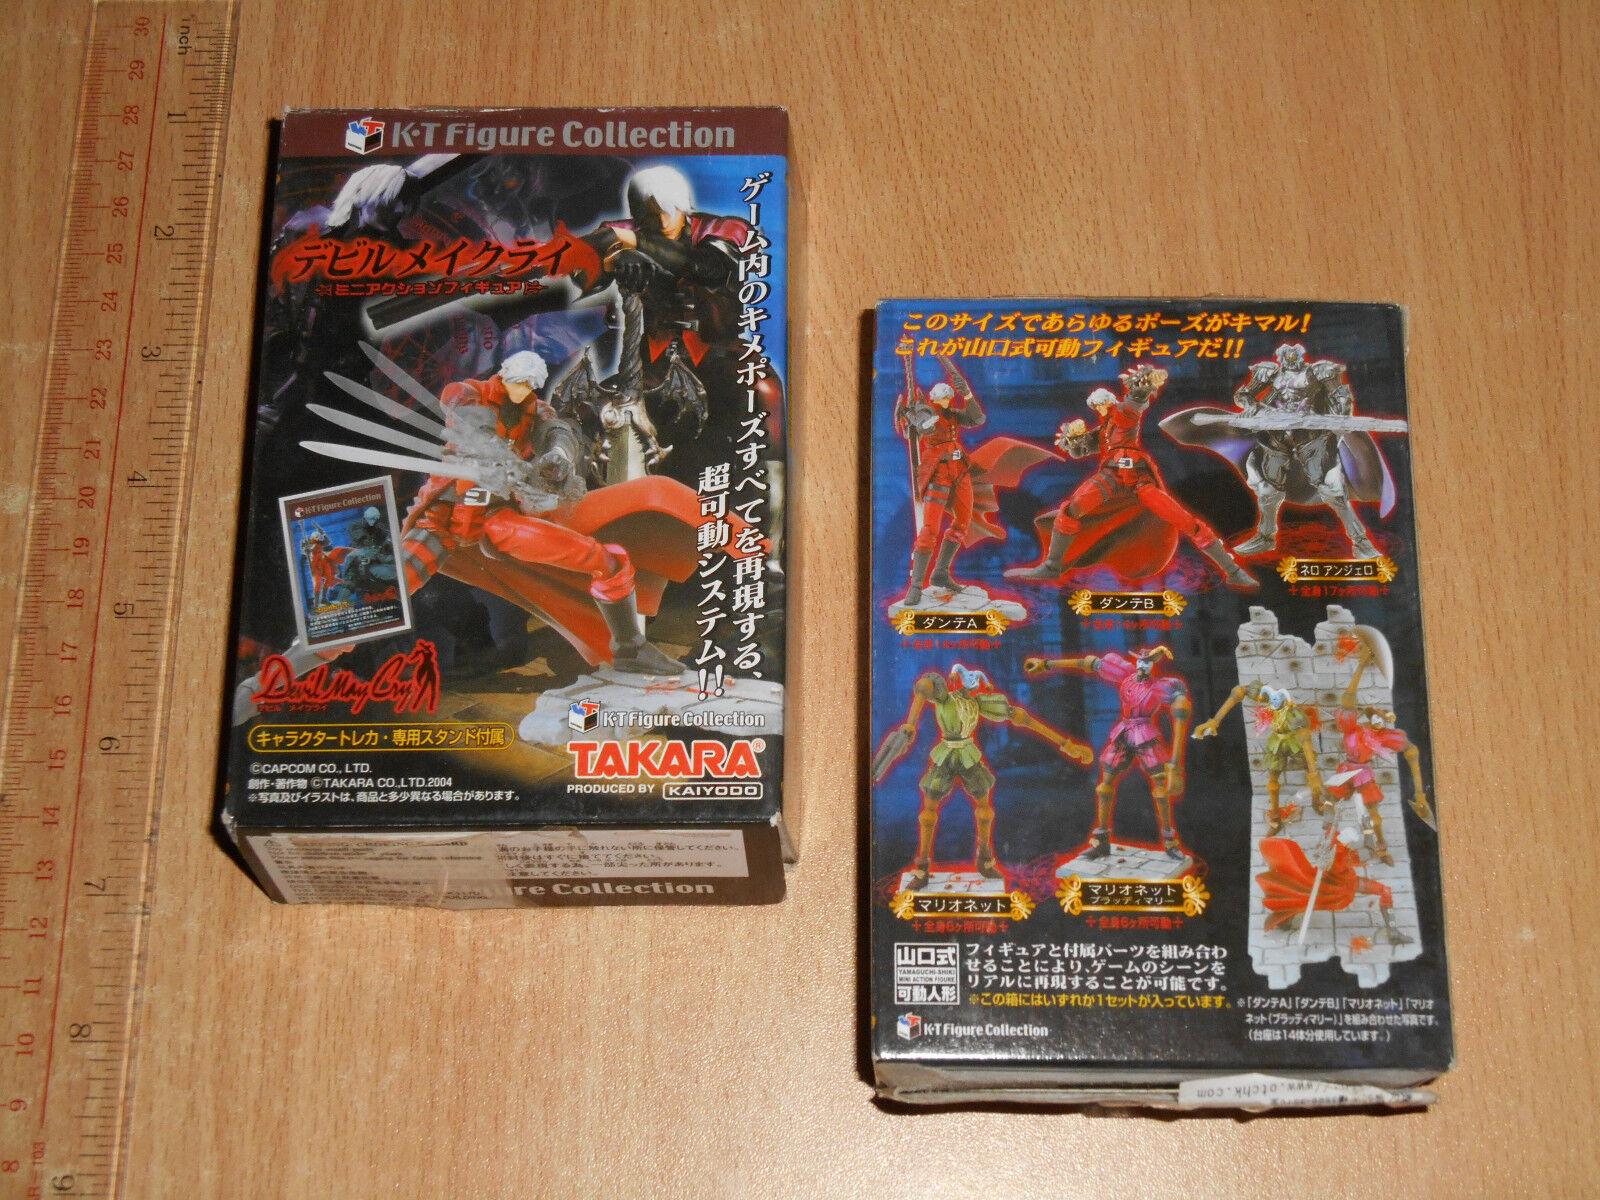 Takara Kaiyodo KT Collection Devil May Cry Trading Figure 1 Set x 5 Box C7 last